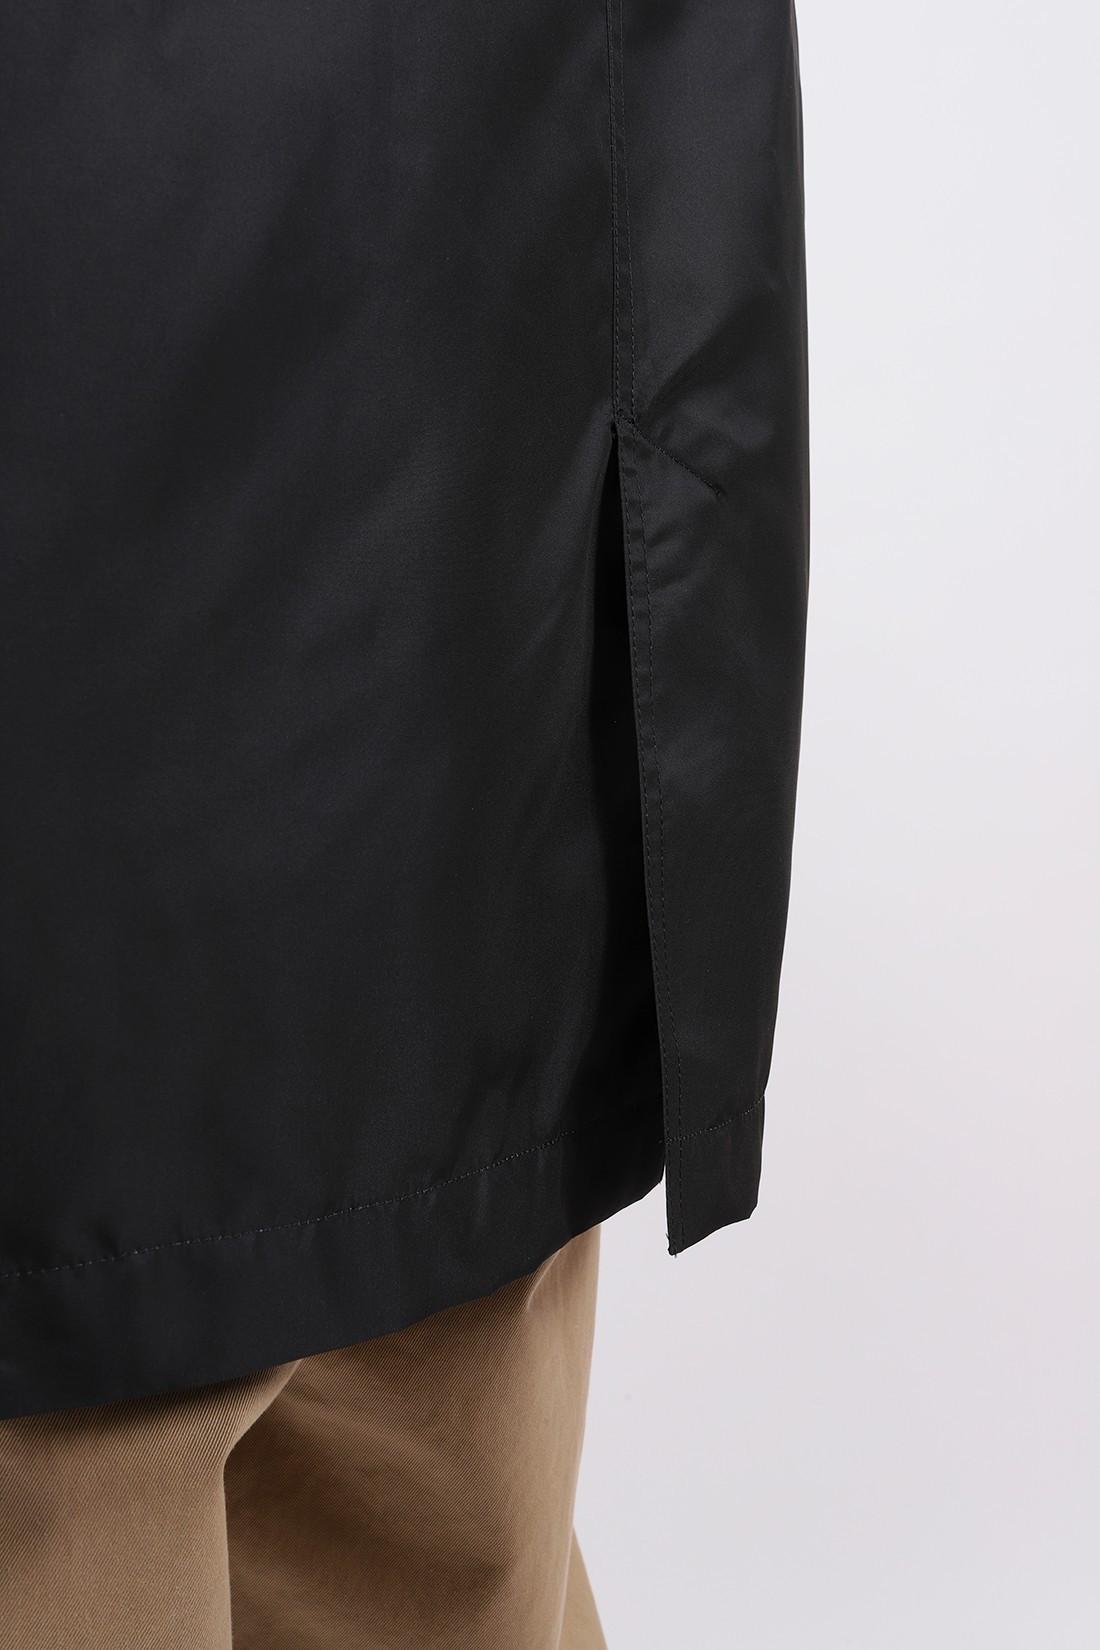 NEIGHBORHOOD / Fade / e-coat Black